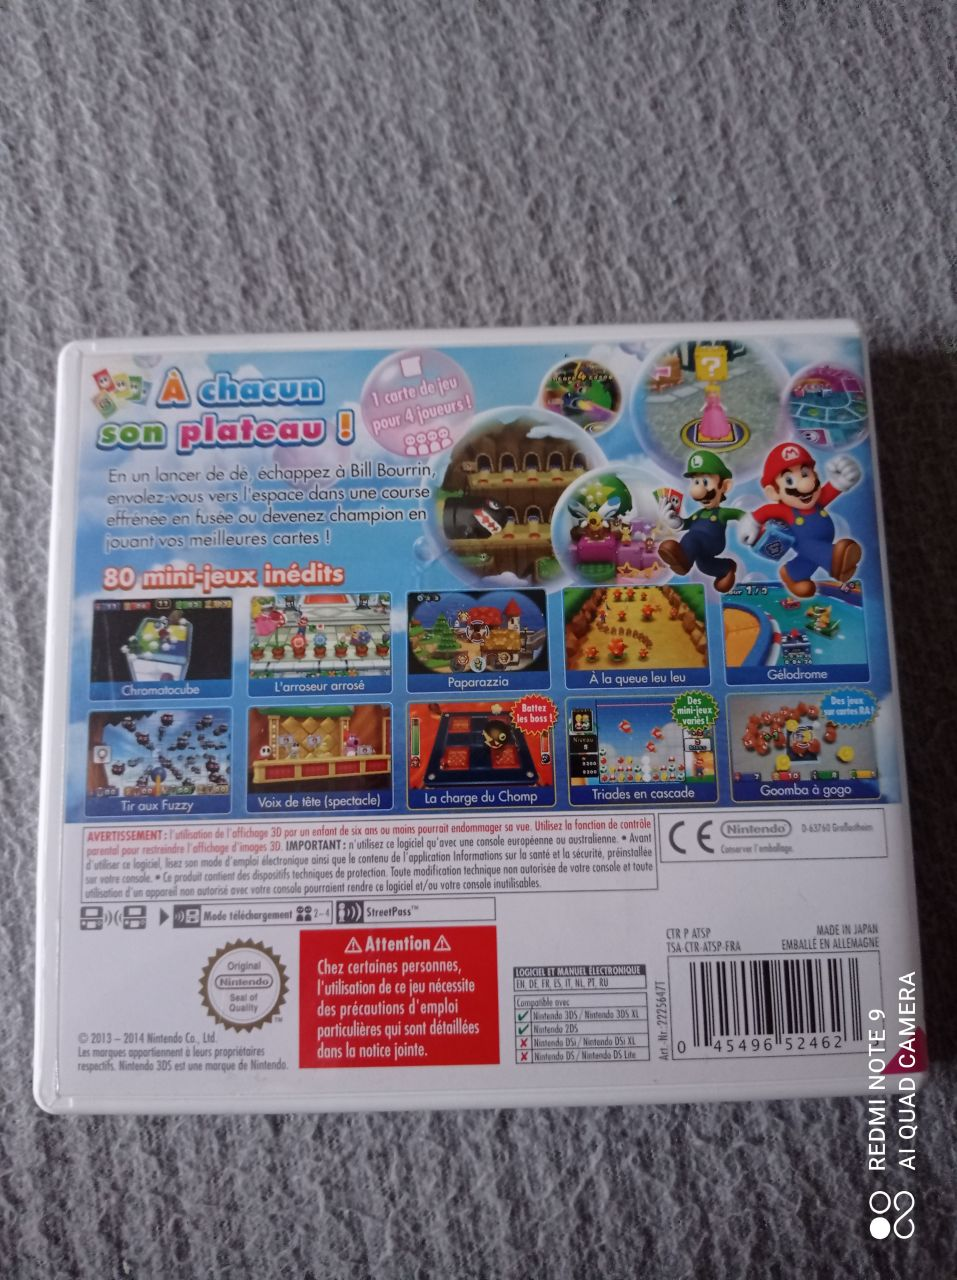 Image article Nintendo - 3DS - Mario party - Island tour